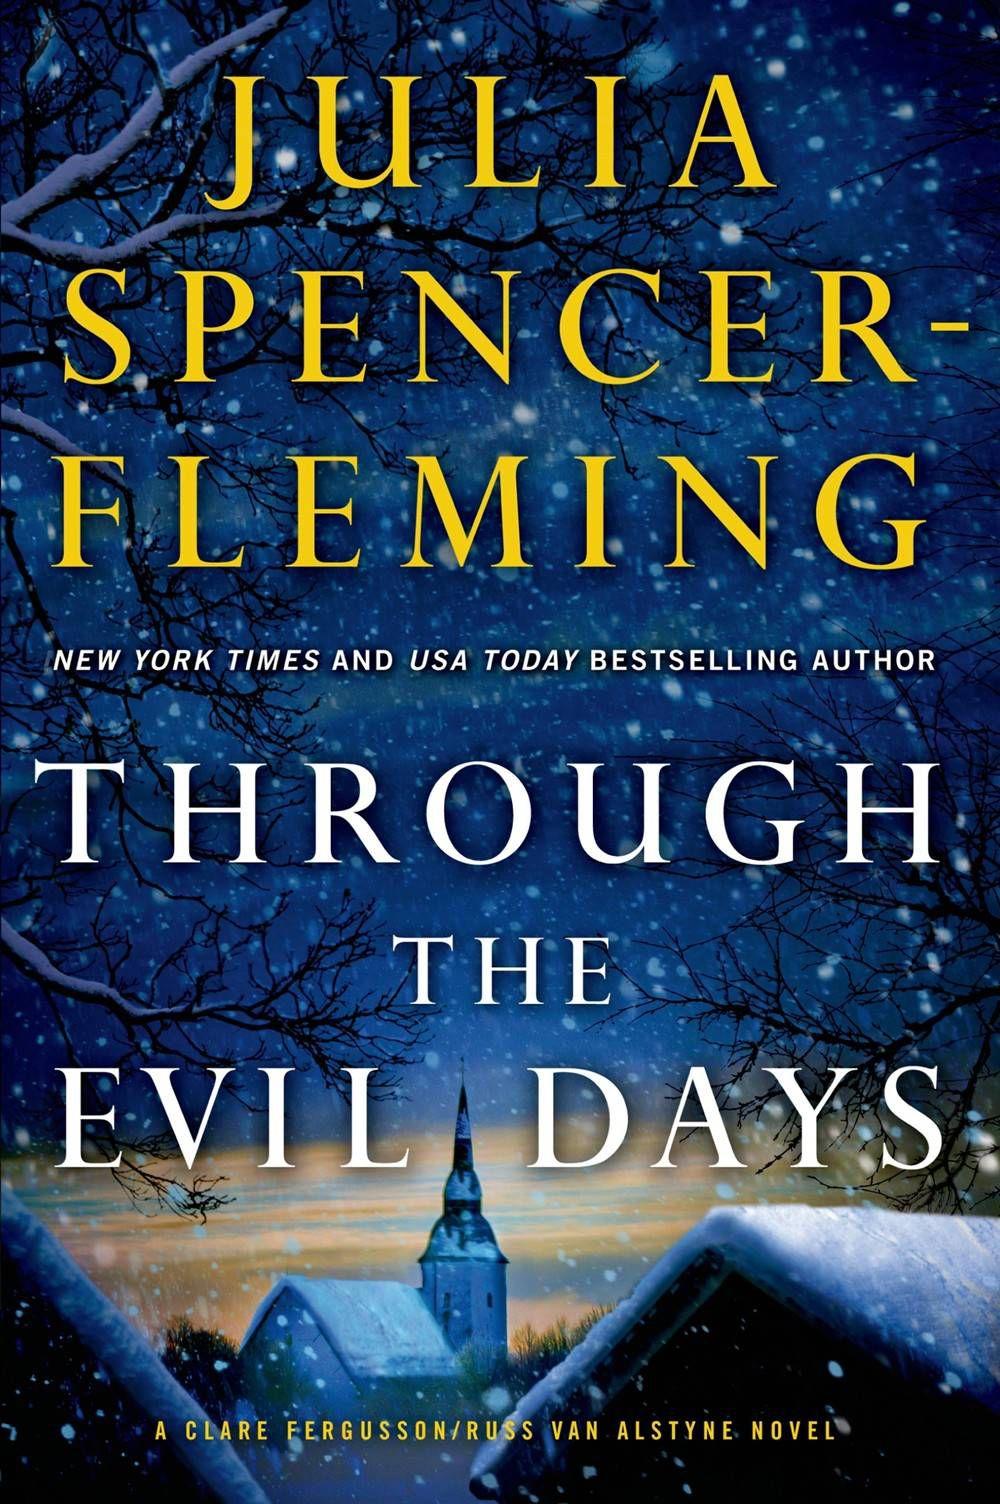 through the evil days - julia spencer fleming